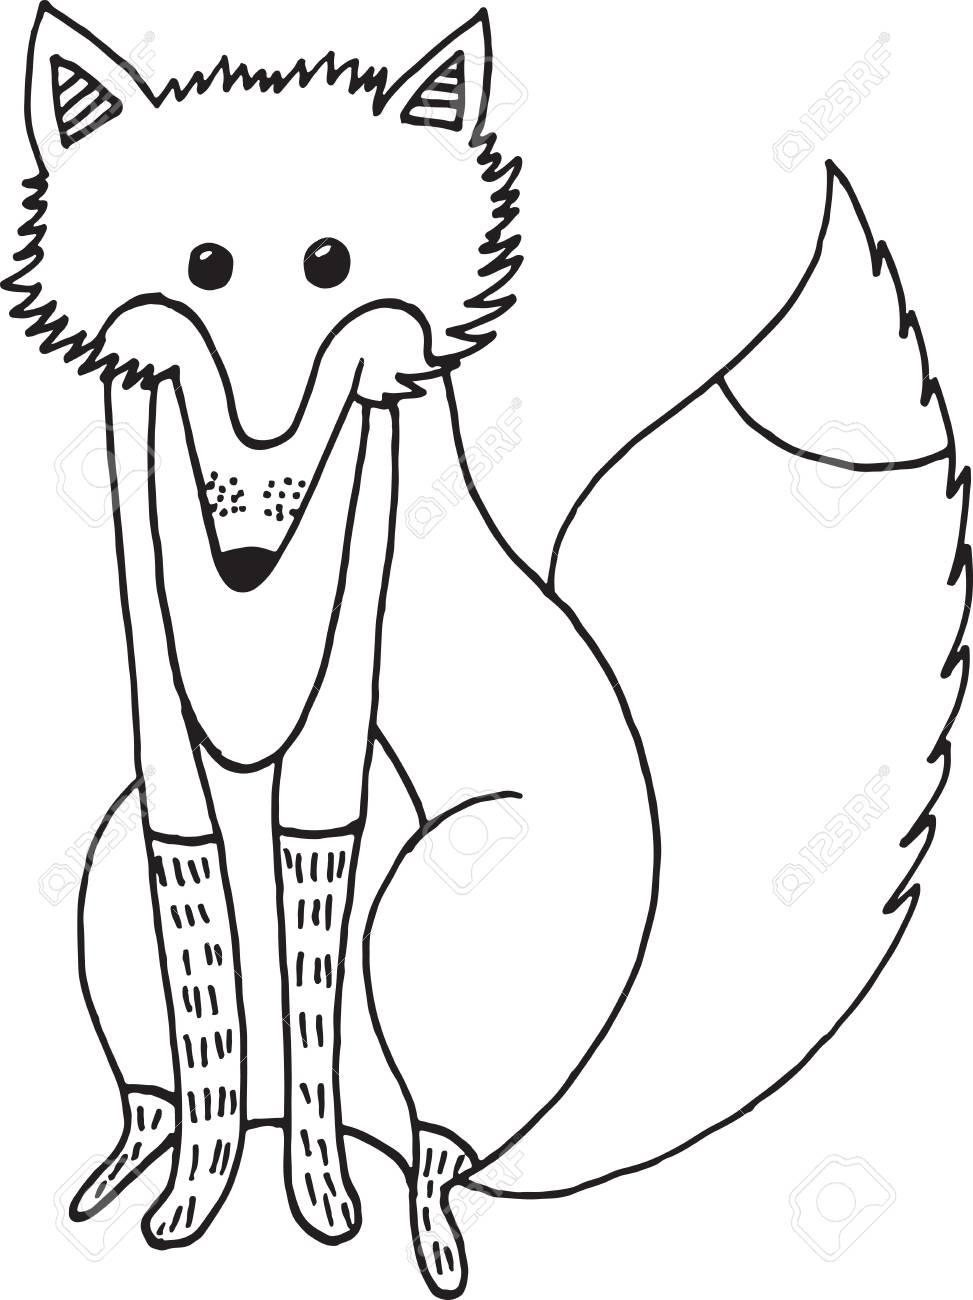 Coloriage Foret Renard.Renard Animal Foret Doodle Renard Dessin Anime Simple Coloriage